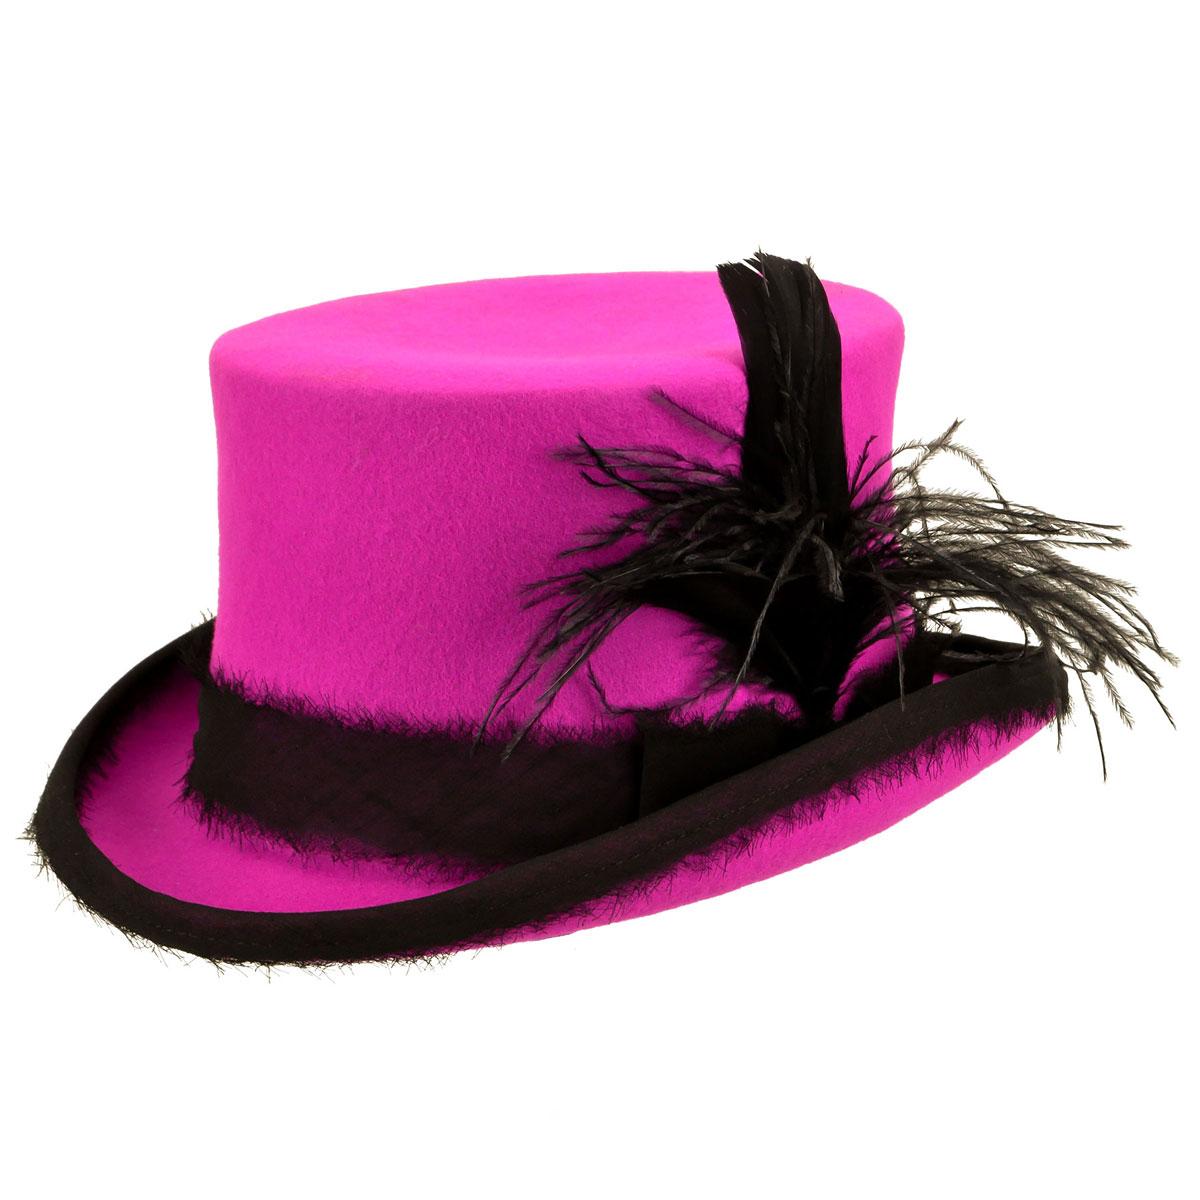 Retro Vintage Style Hats Renegade by Bailey reg Vivienne Top Hat $88.00 AT vintagedancer.com